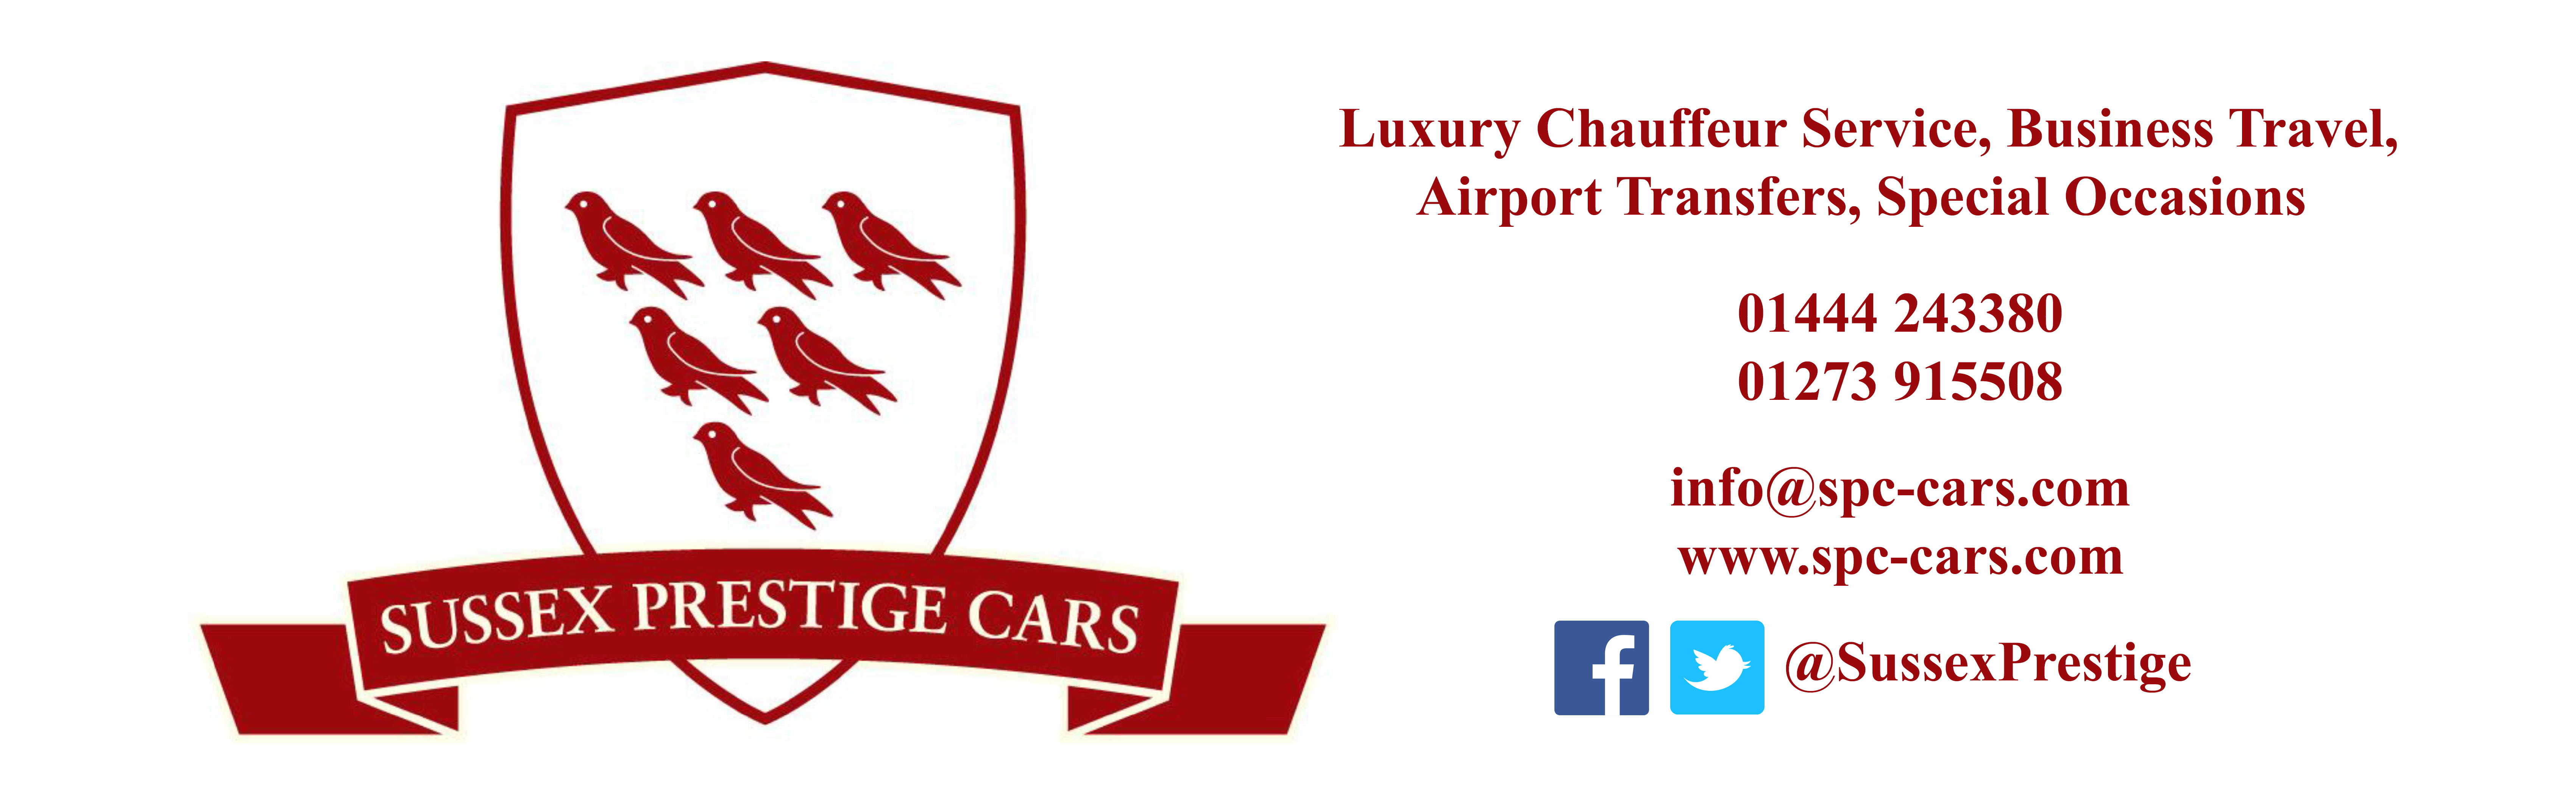 Sussex Prestige Cars